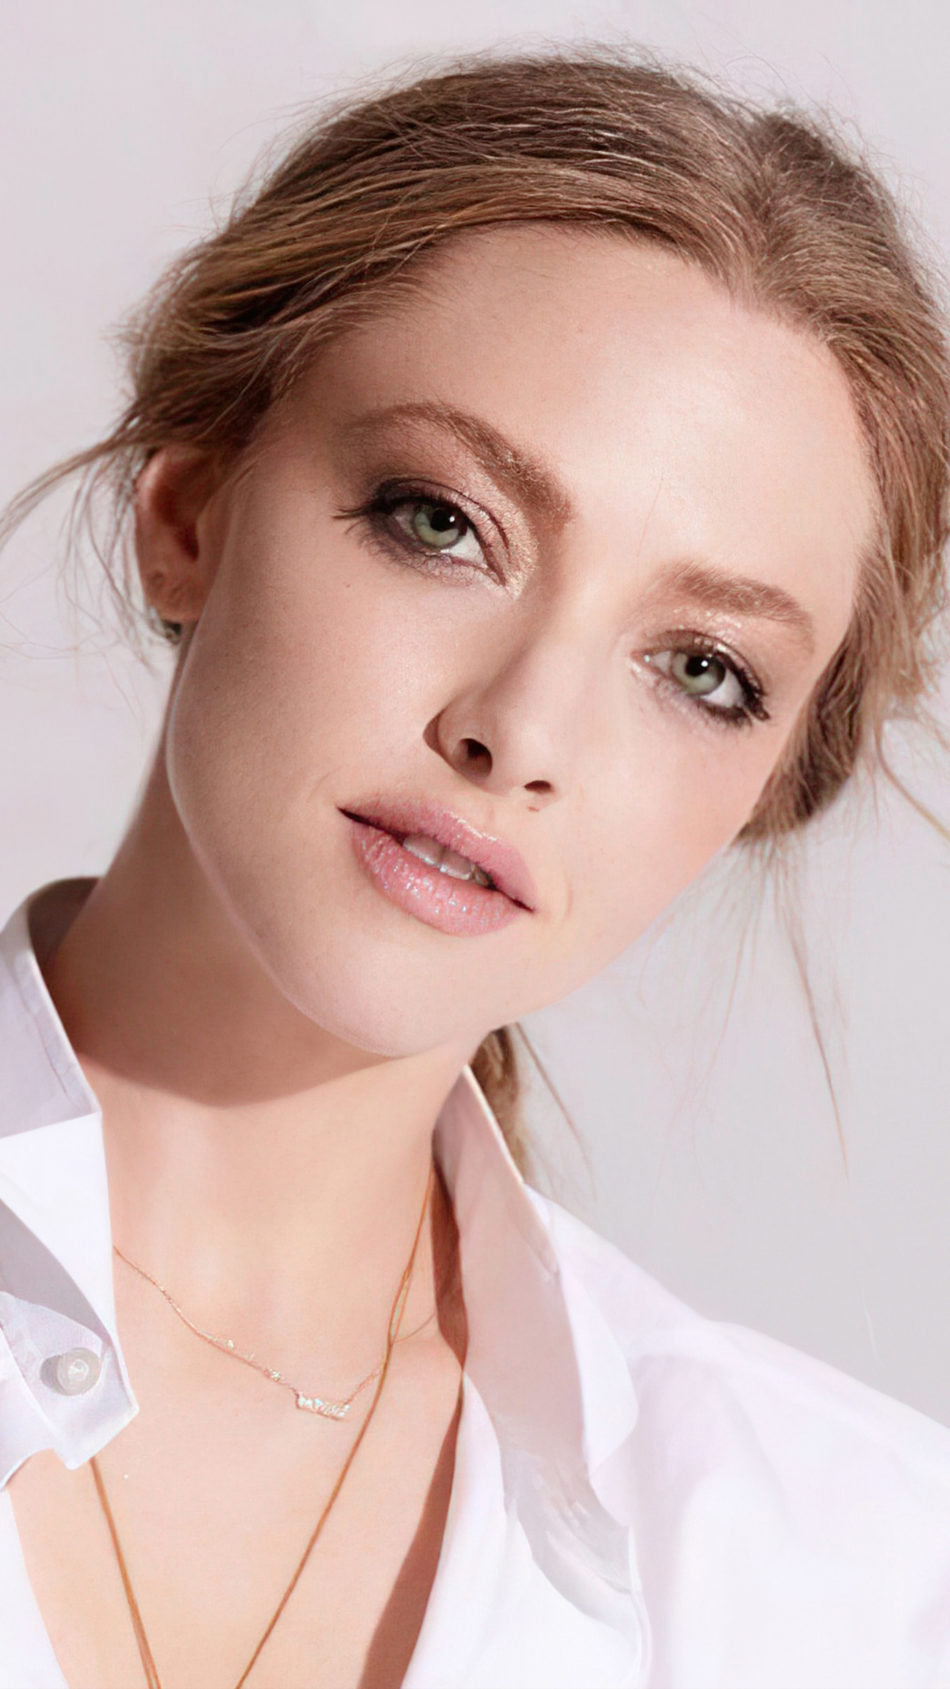 Beautiful Actress Amanda Seyfried In White Dress 4K Ultra HD Mobile Wallpaper